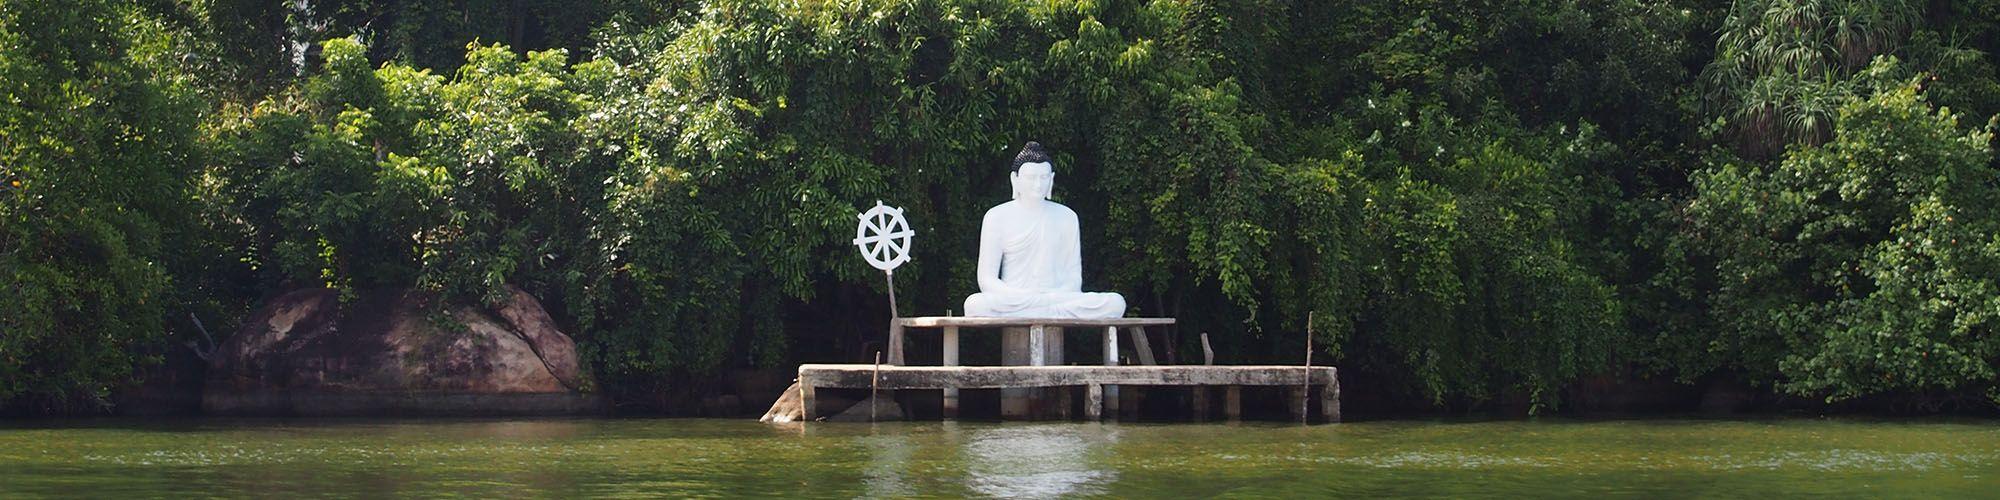 Sri Lanka, Madu Ganga, Bouddha